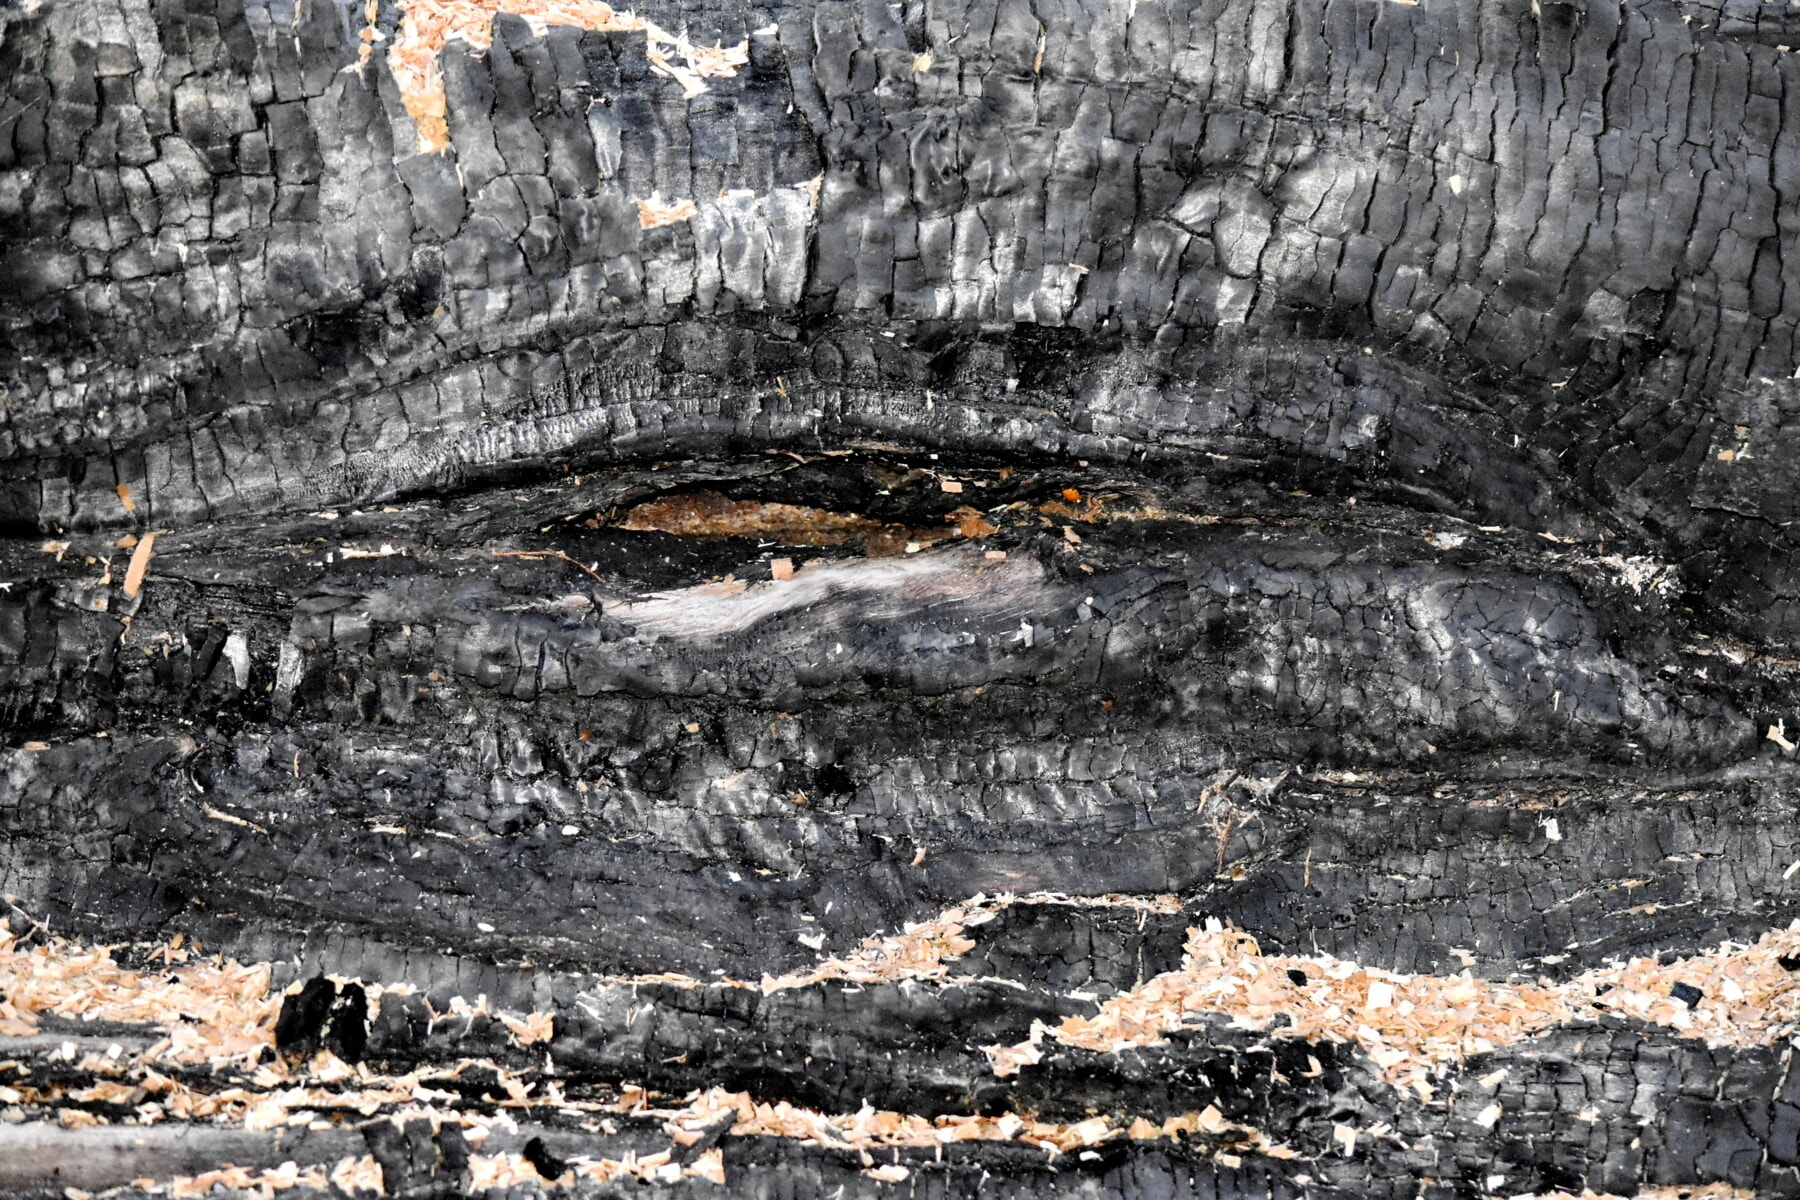 Brennen, Dunkel, Schwarz, Textur, Oberfläche, Holz, Esche, Kohle, Natur, Muster